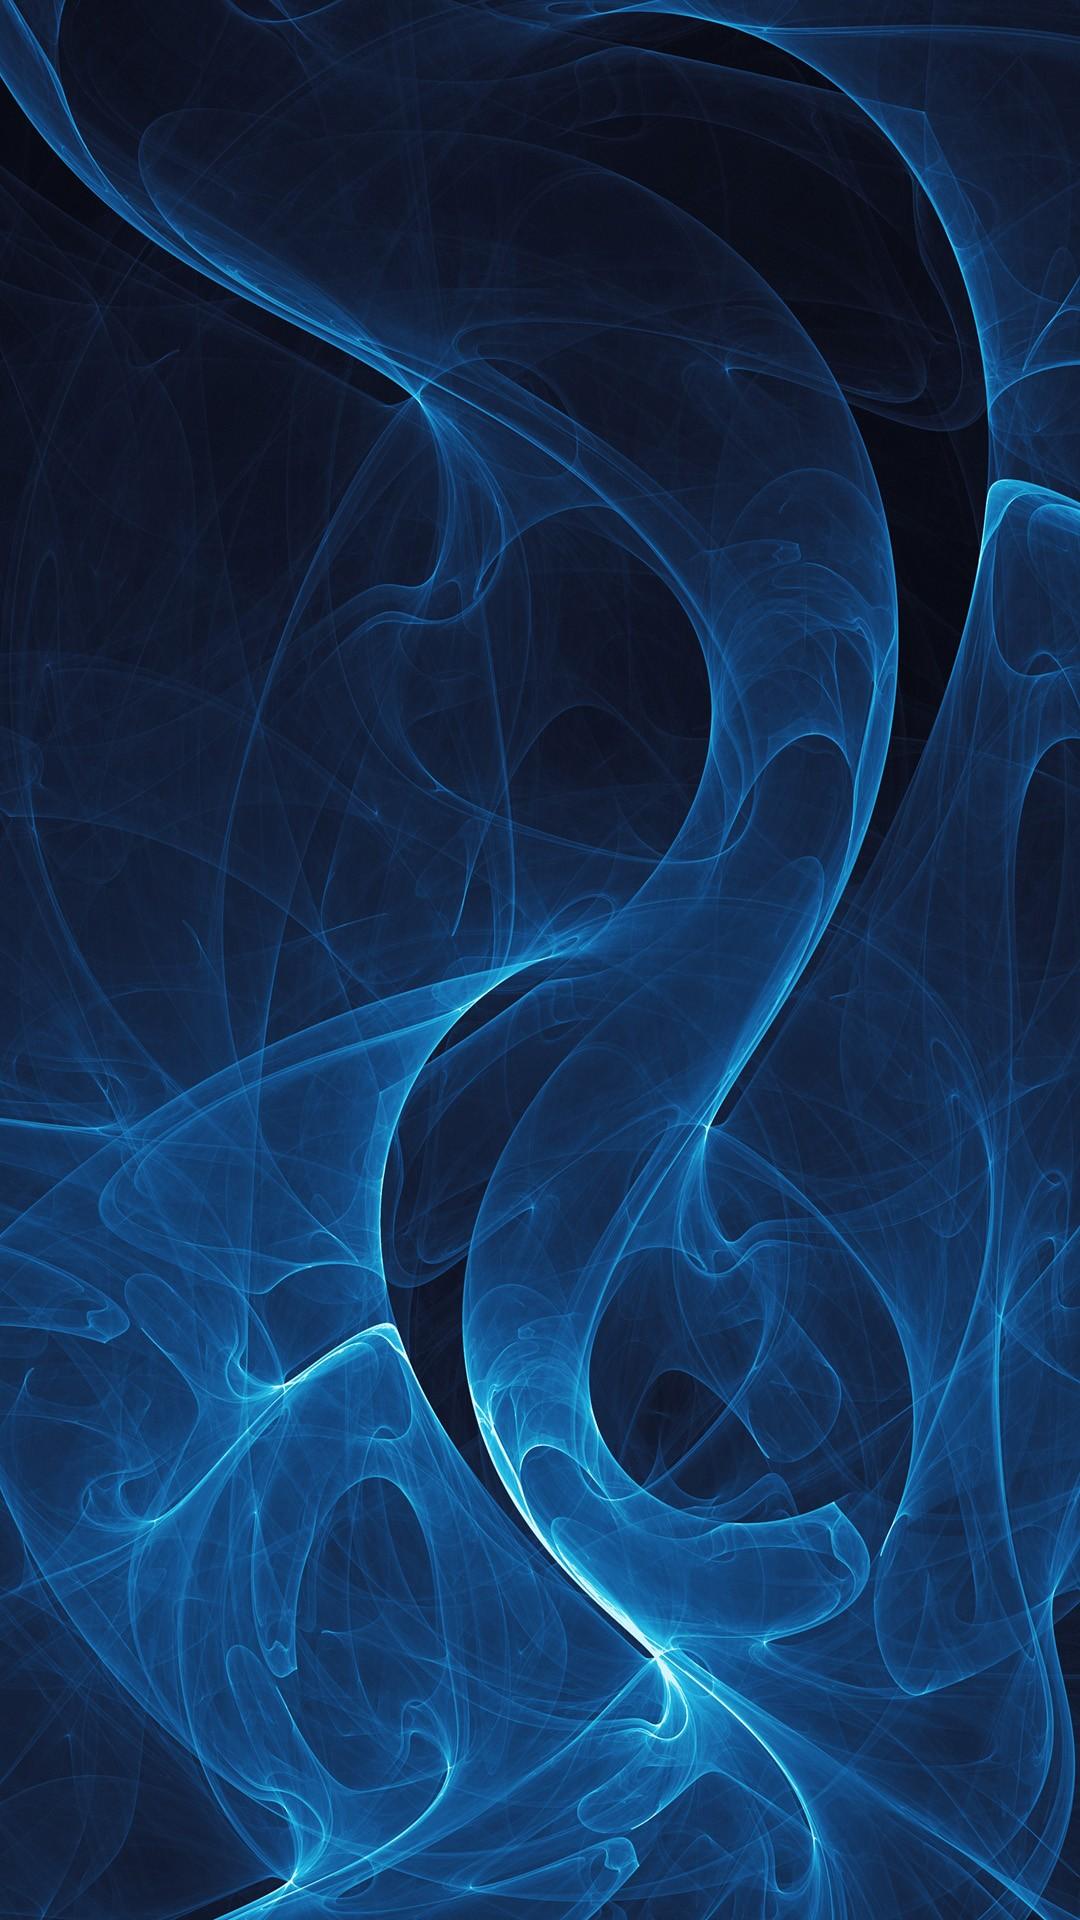 Freddy Krueger Wallpaper 3d Blue Galaxy Wallpaper 183 ① Download Free Amazing Full Hd